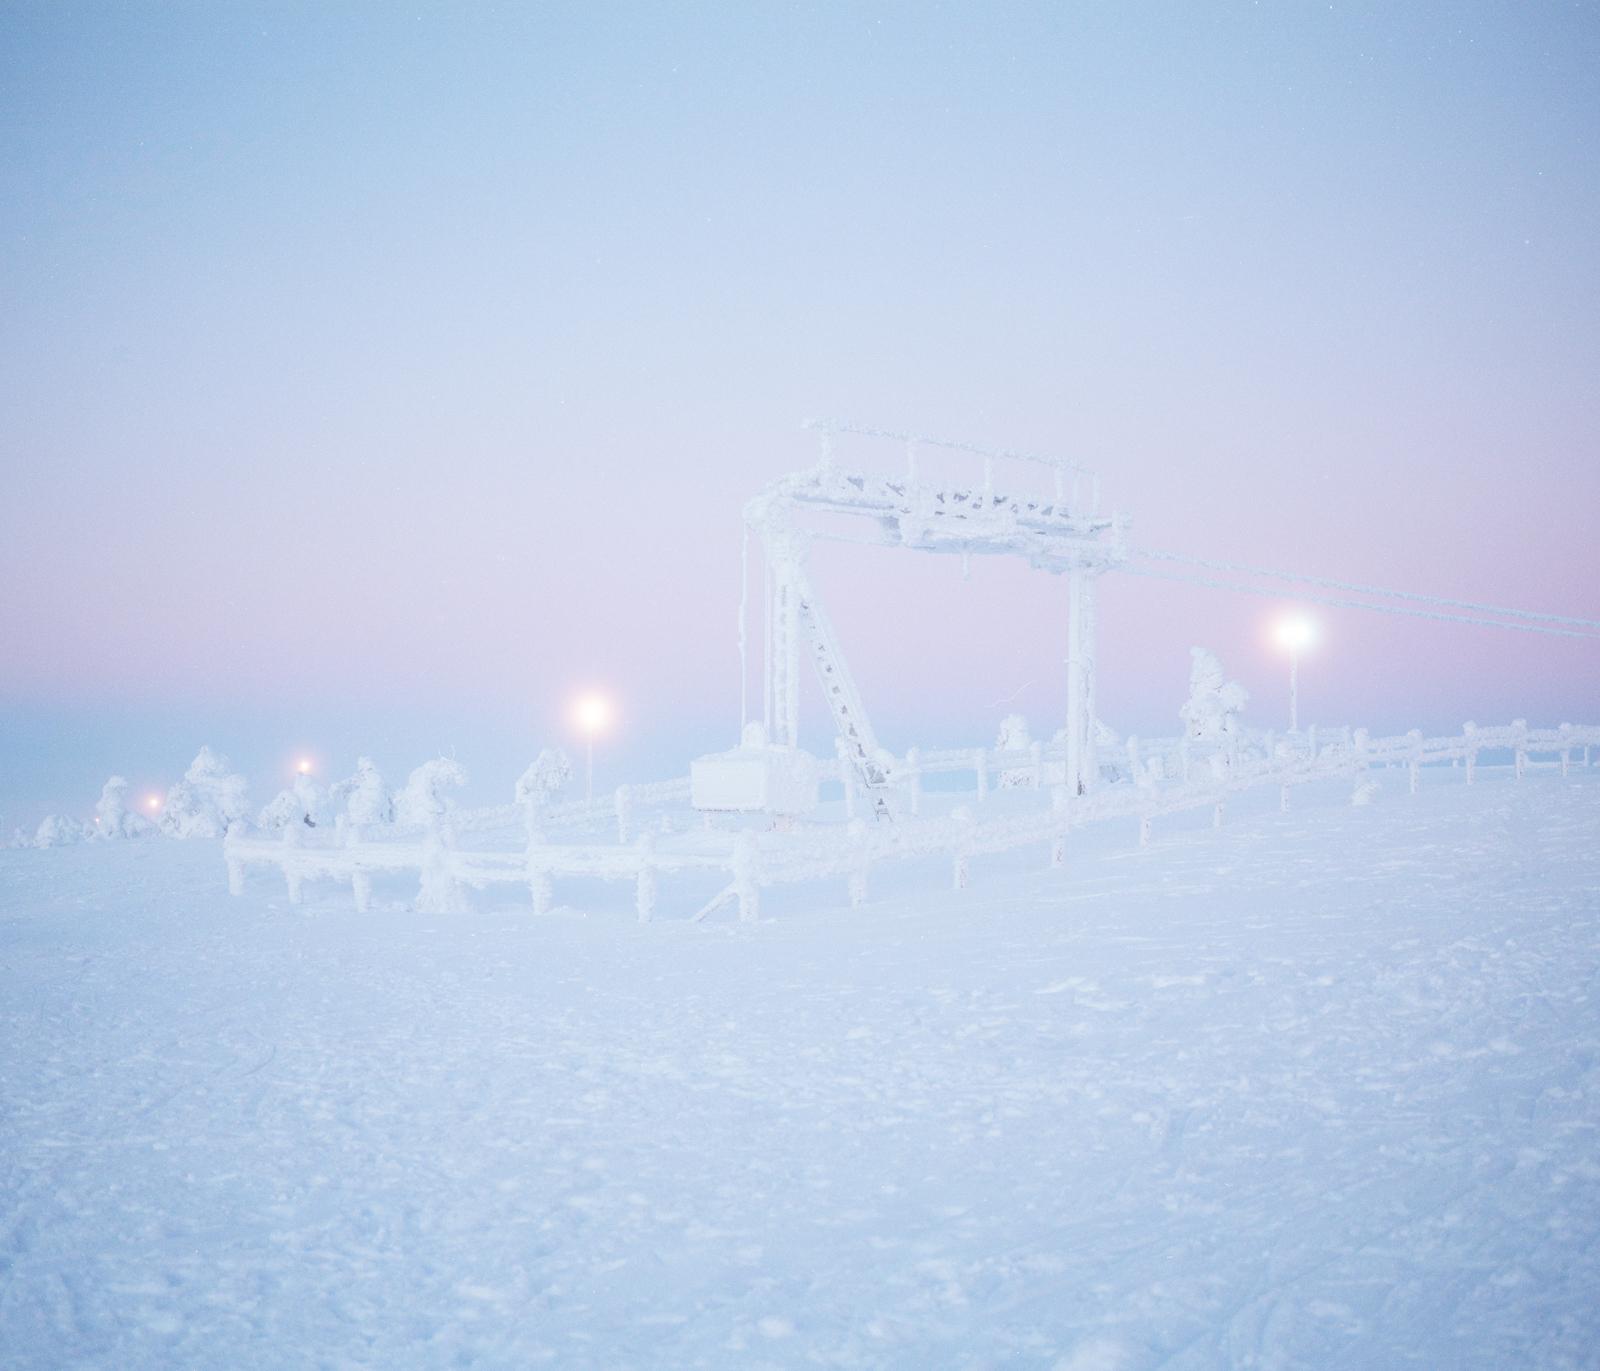 Lapland-5.jpg